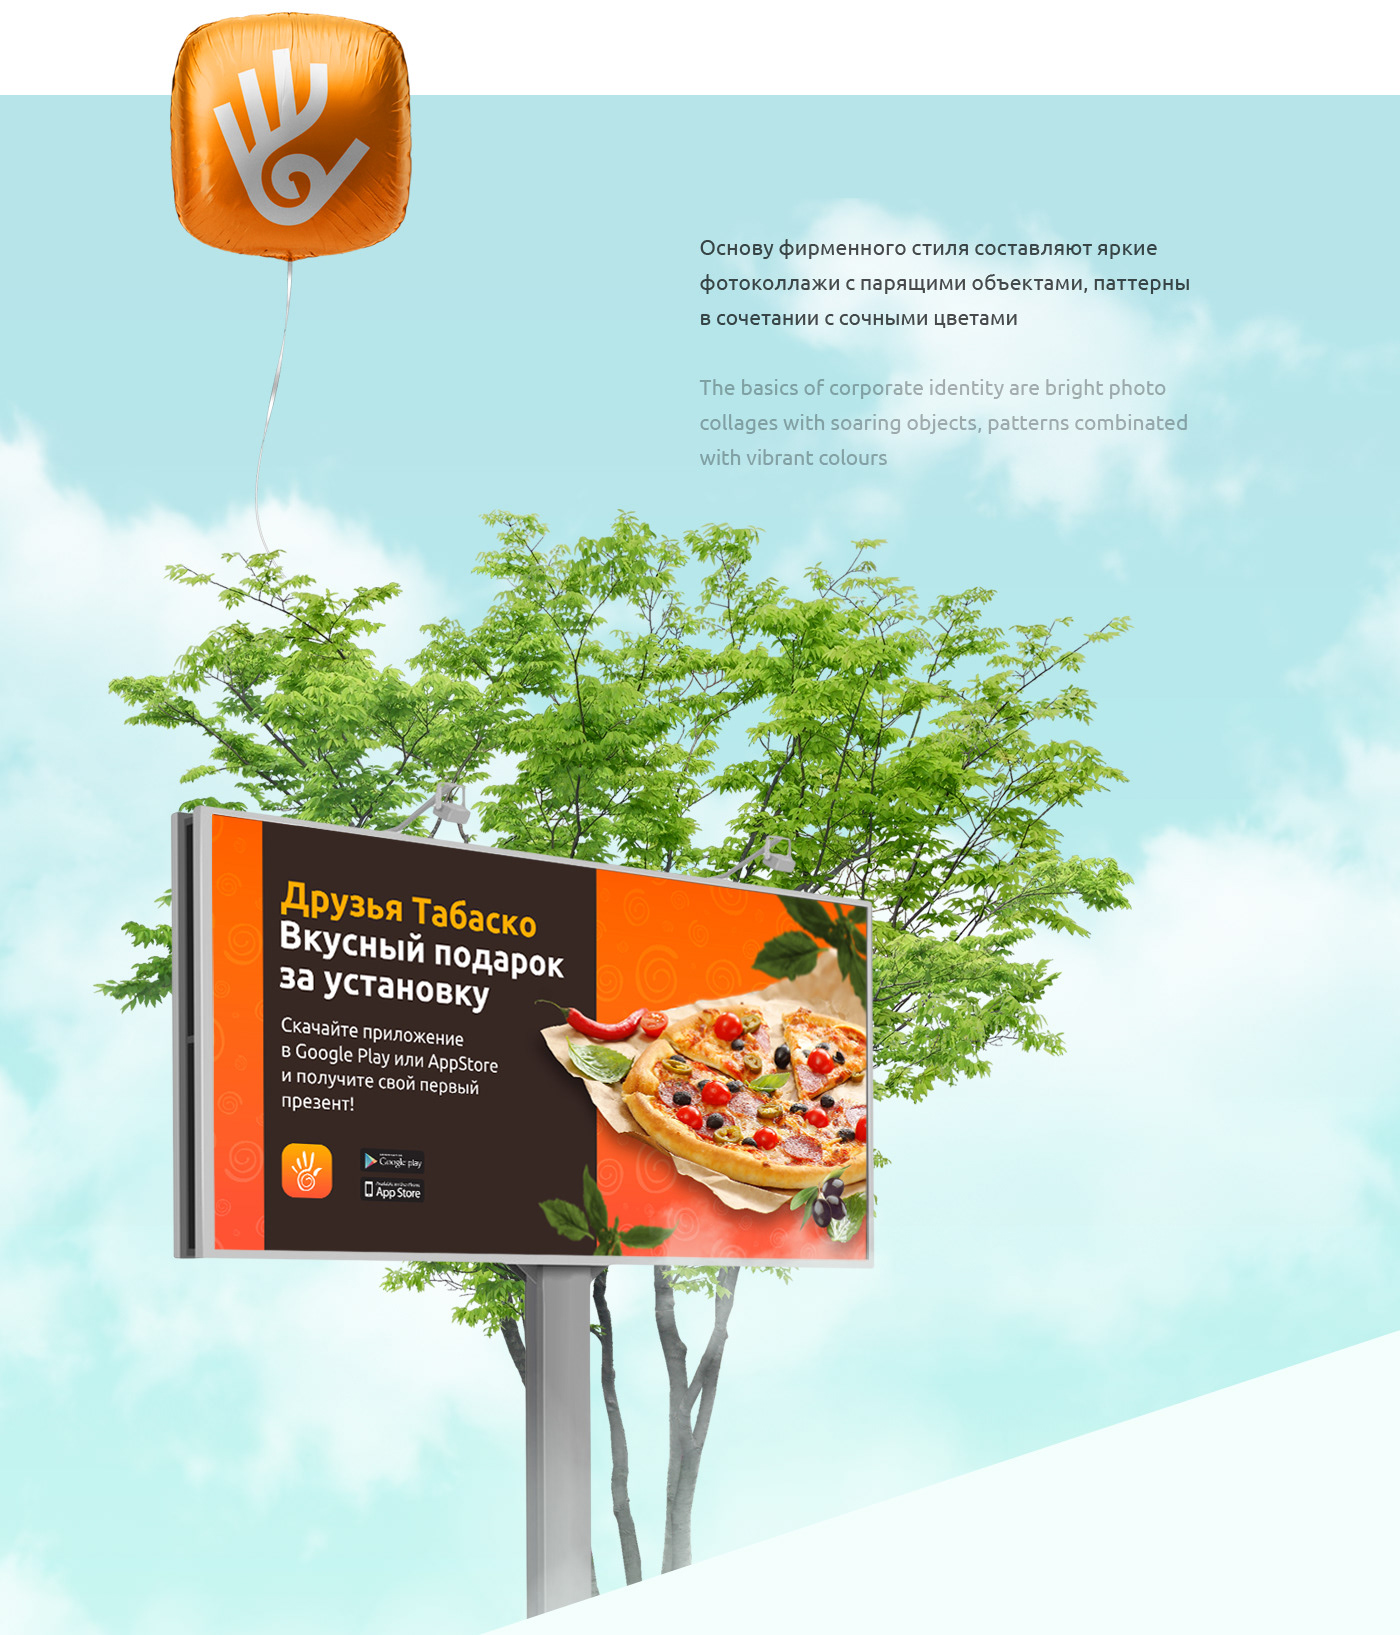 mobile app ios android rs loyalty tabasko restaurant Food  HORECA